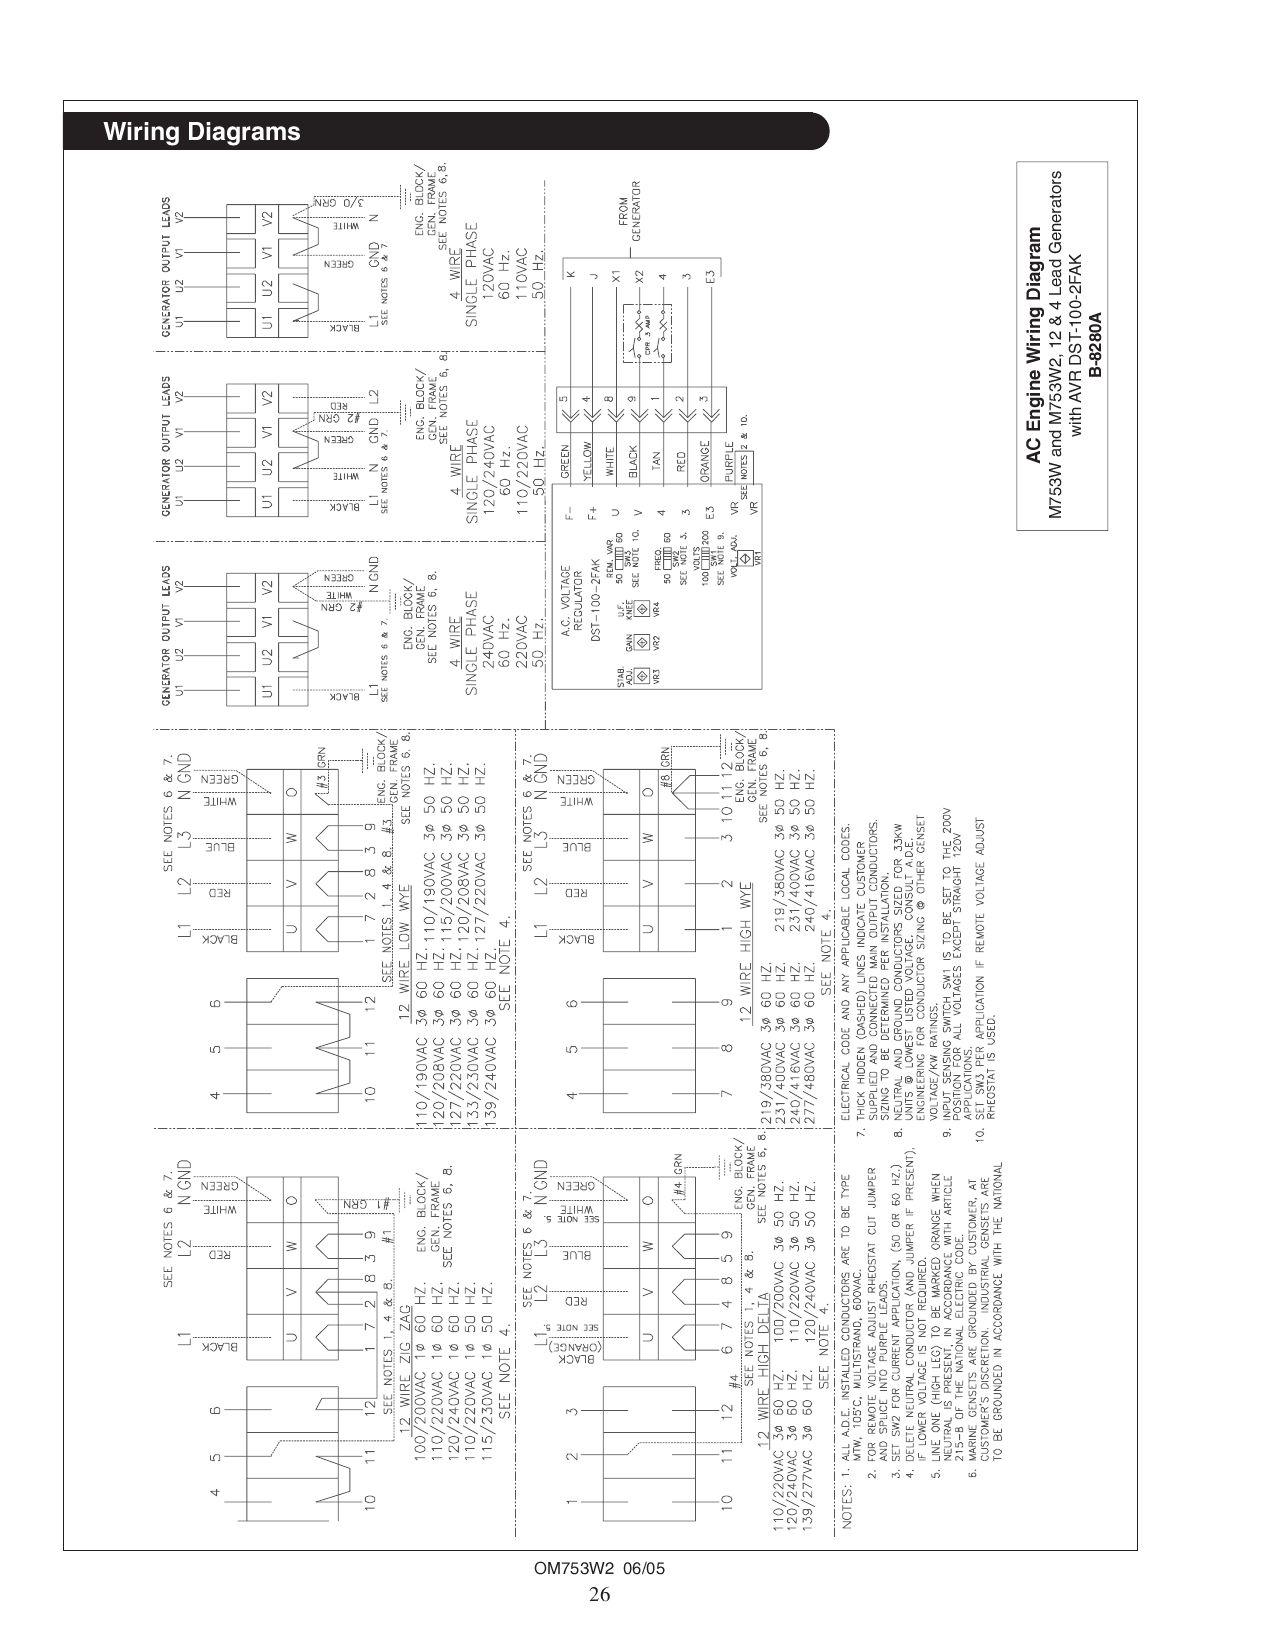 3 phase generator wiring diagram 9 lead 240v single phase